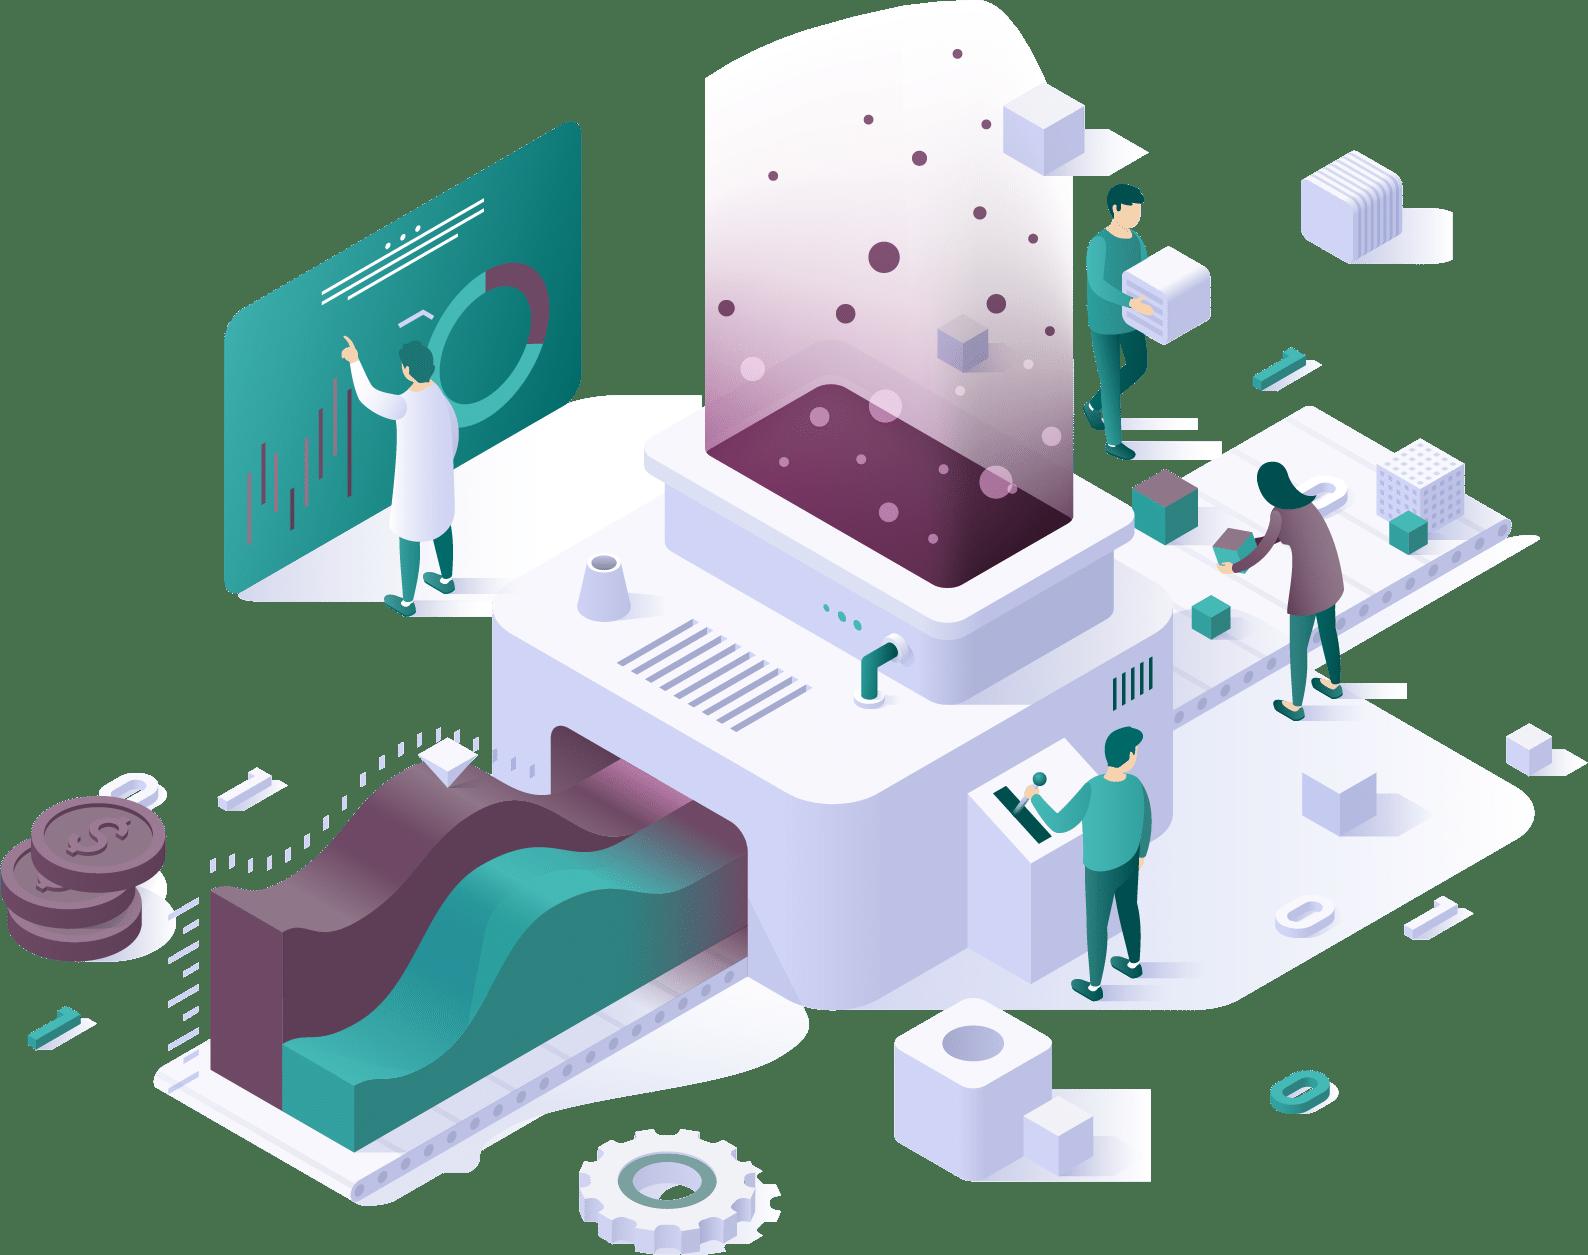 Isometric representation of application development